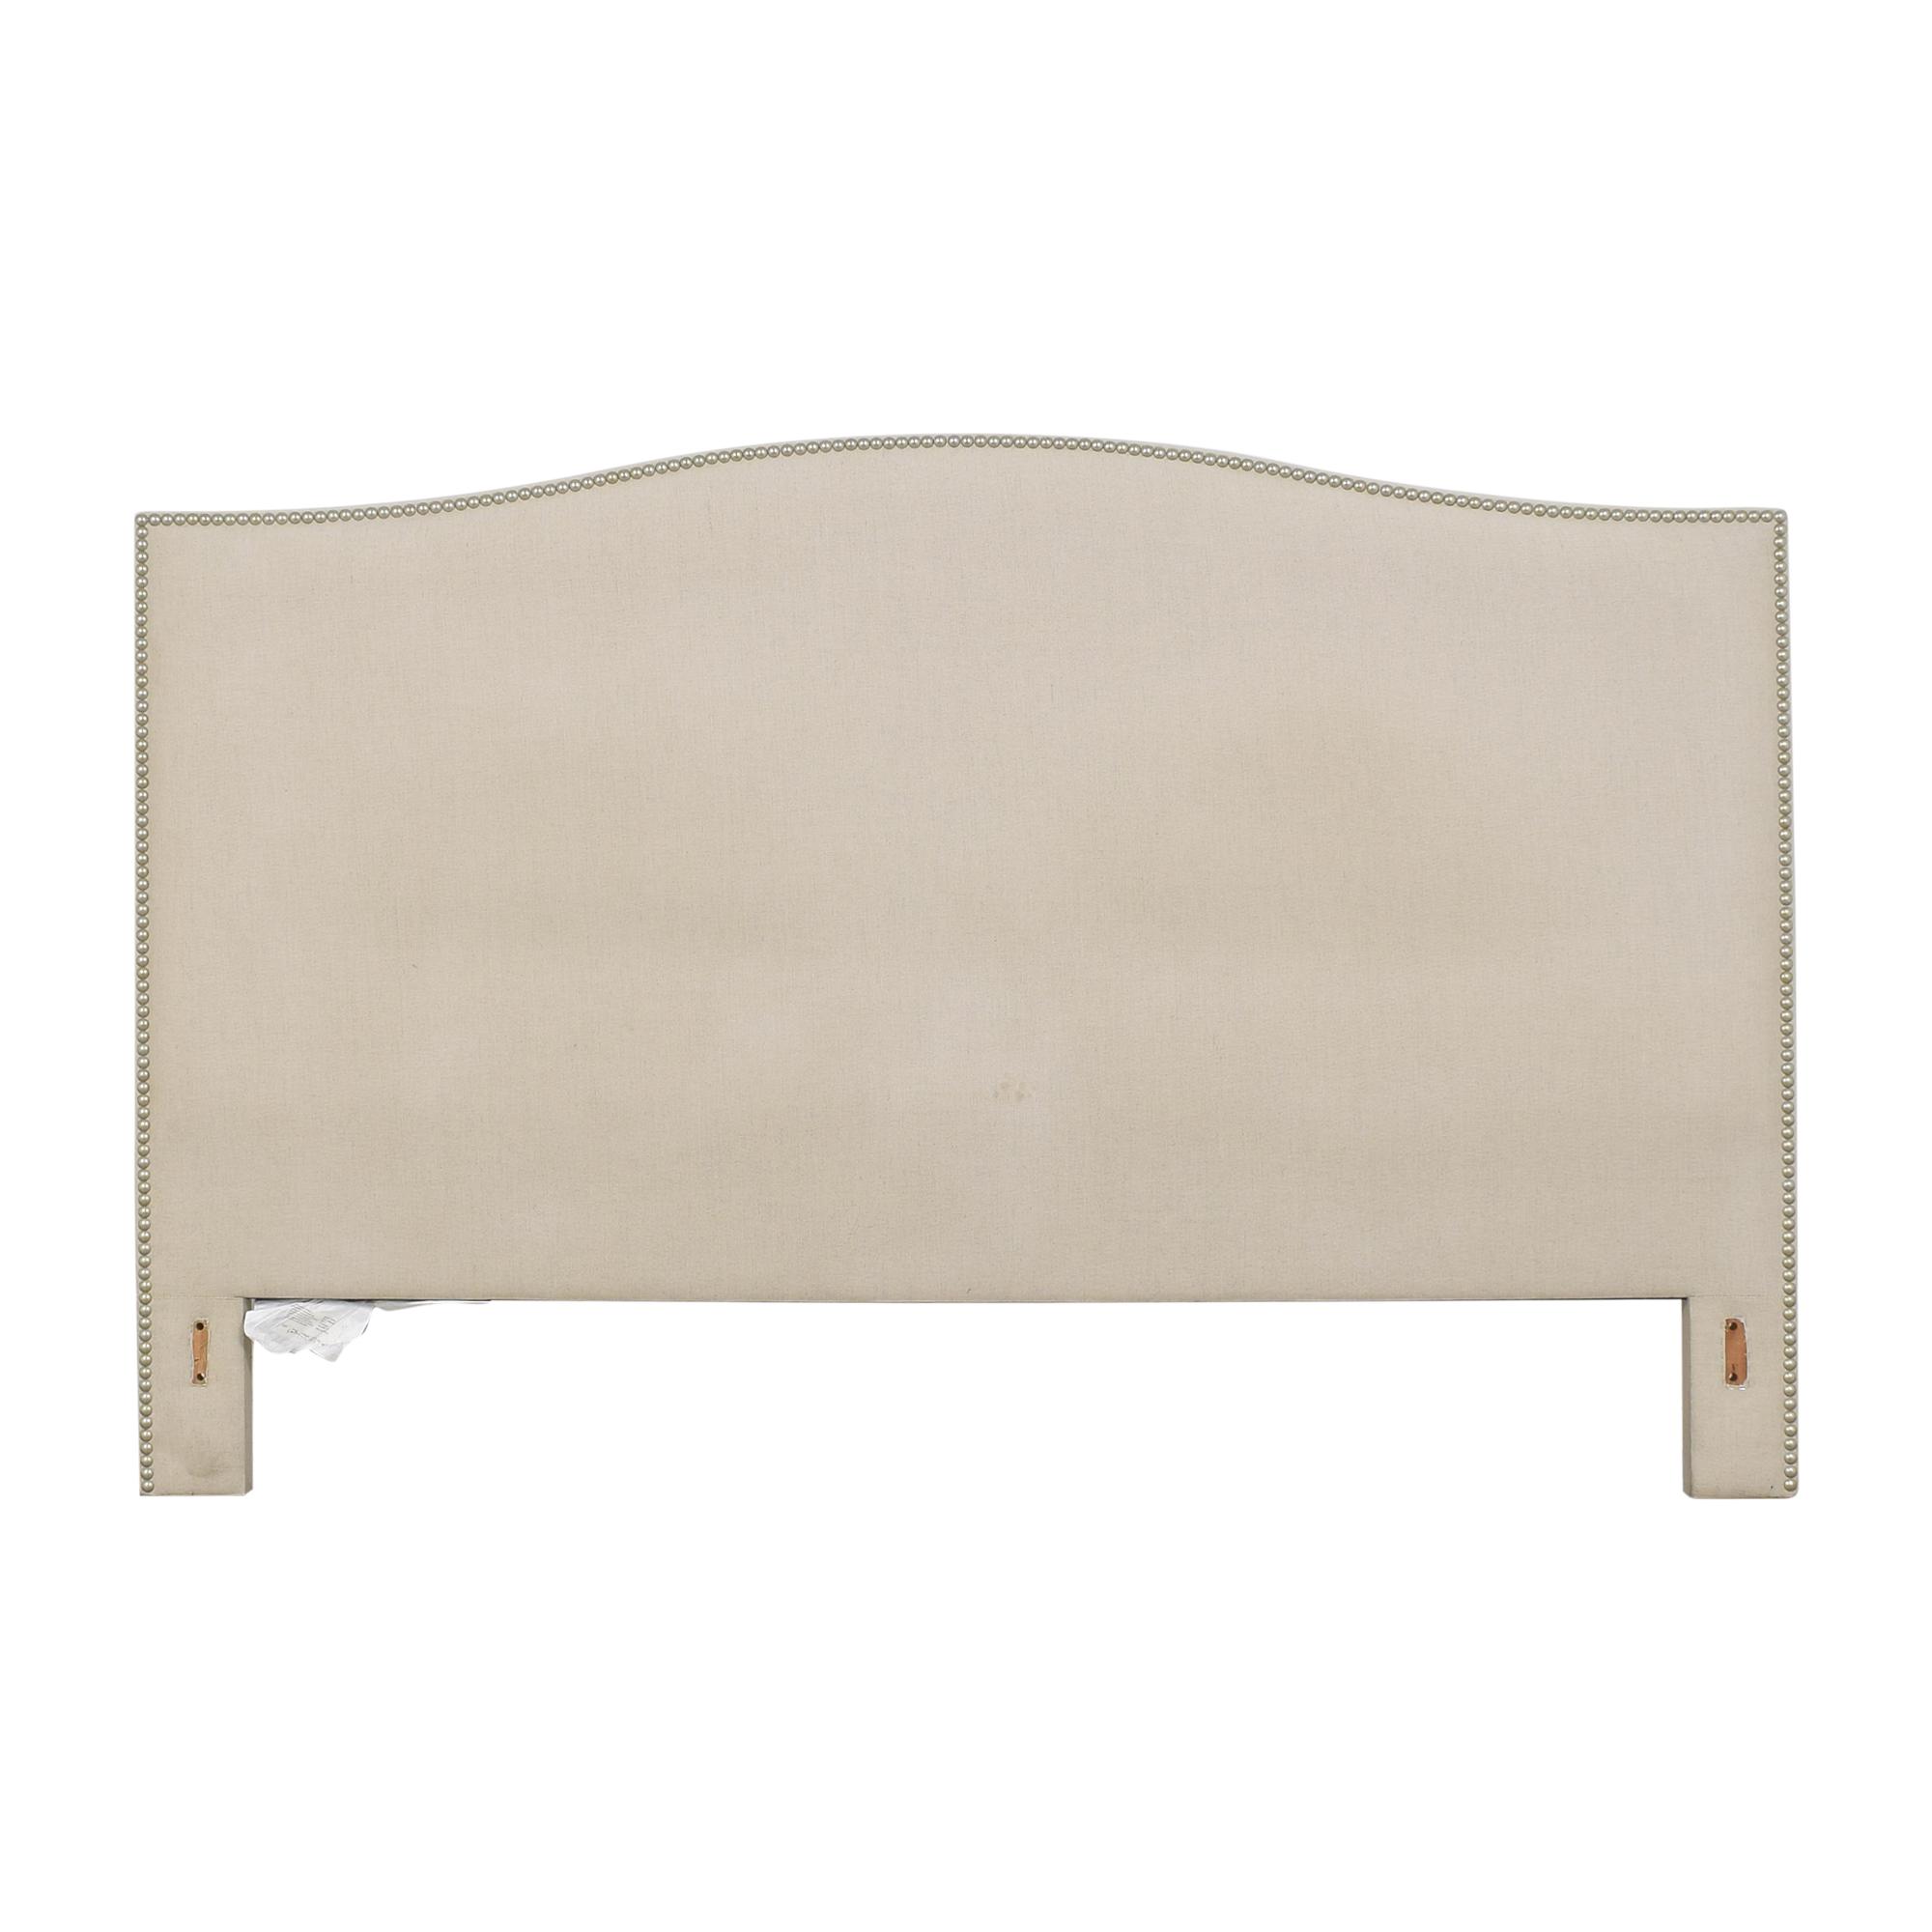 Crate & Barrel Crate & Barrel Colette Upholstered Nailhead King Headboard beige